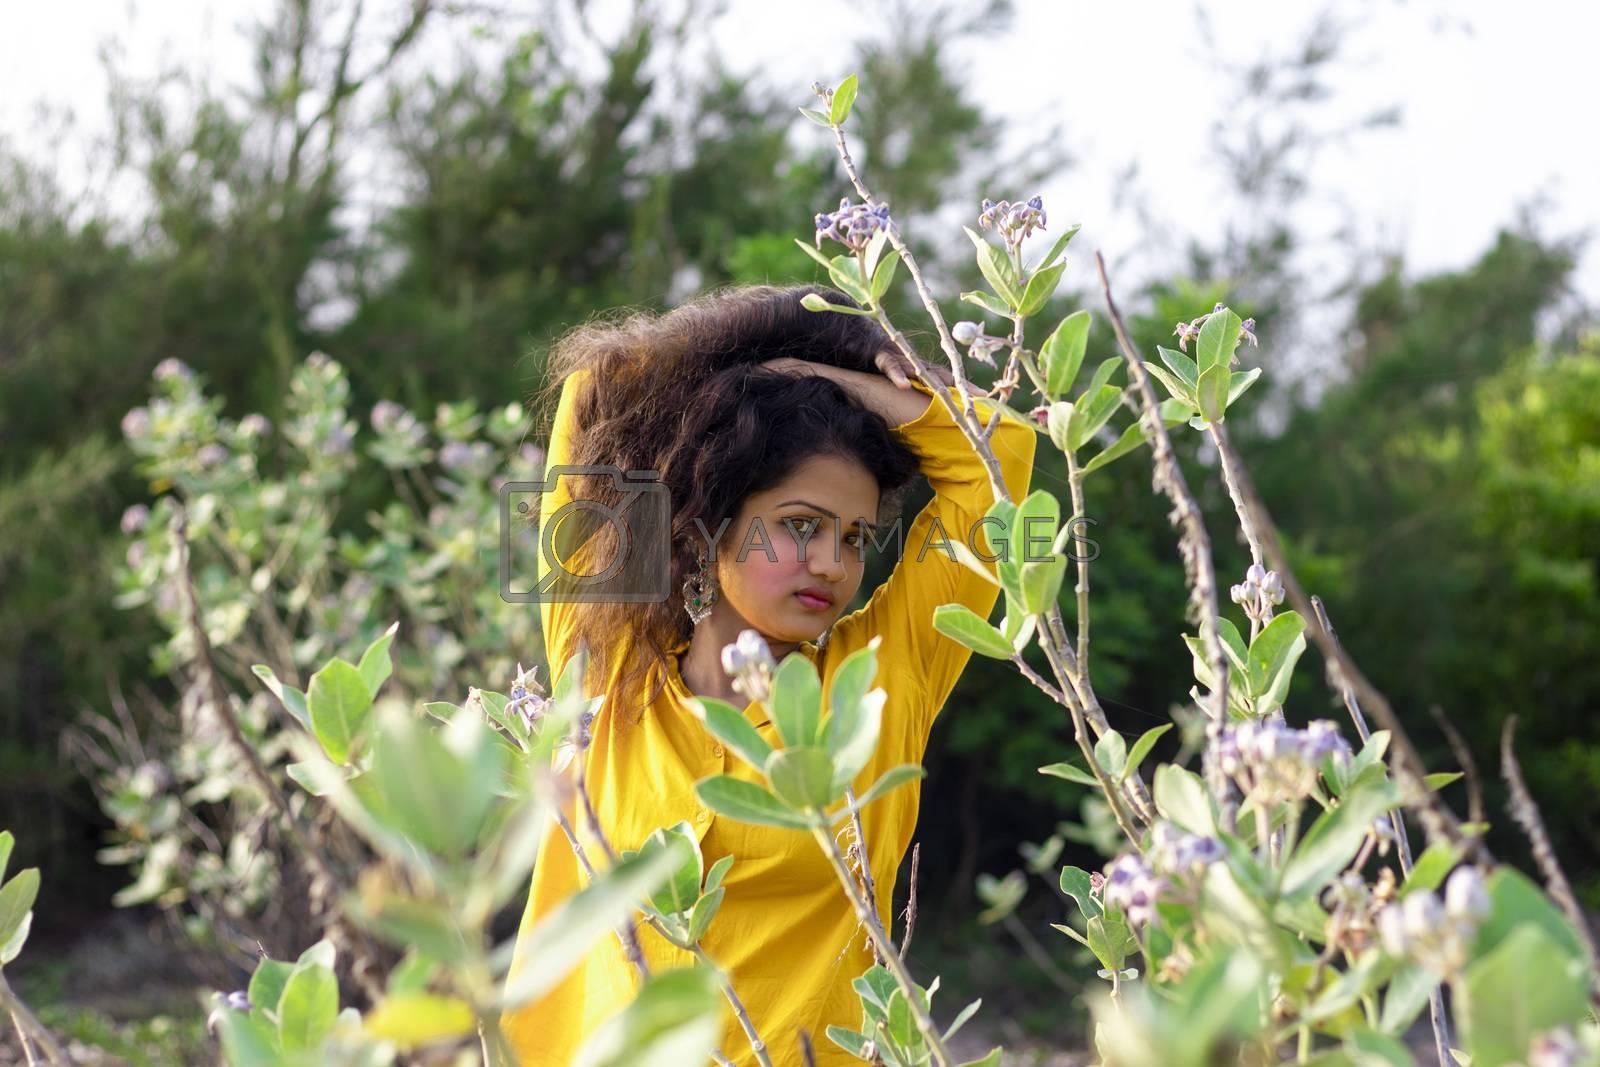 A pretty Asian female model standing near the Aak, Madar (Calotropis gigantea) tree wearing a yellow top , beautiful looking at camera